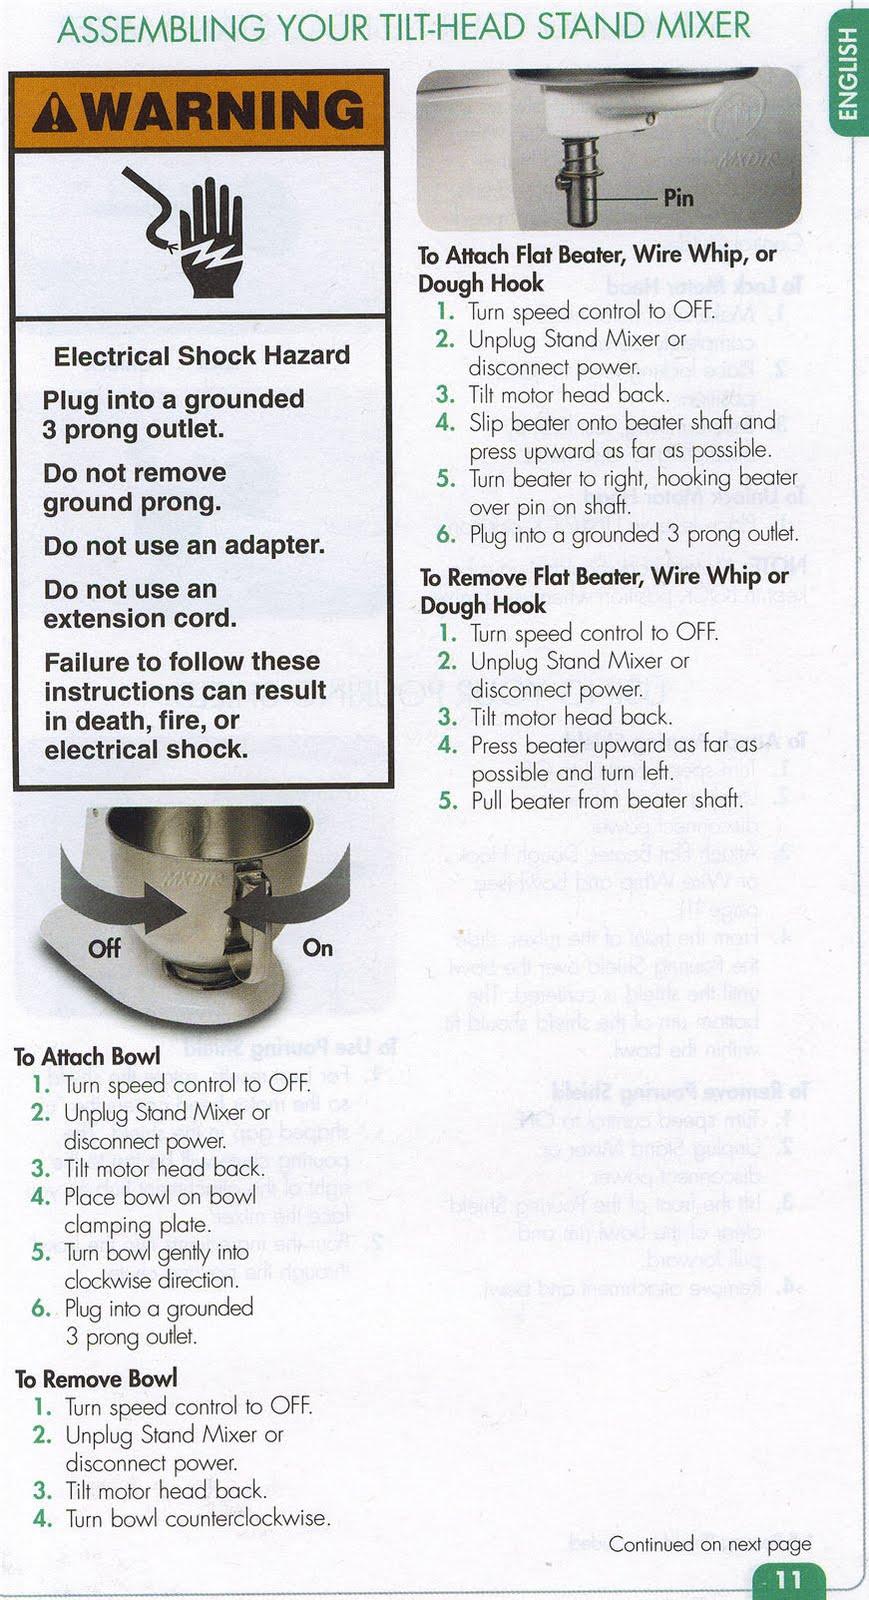 kitchenaid stand mixer instructions manual